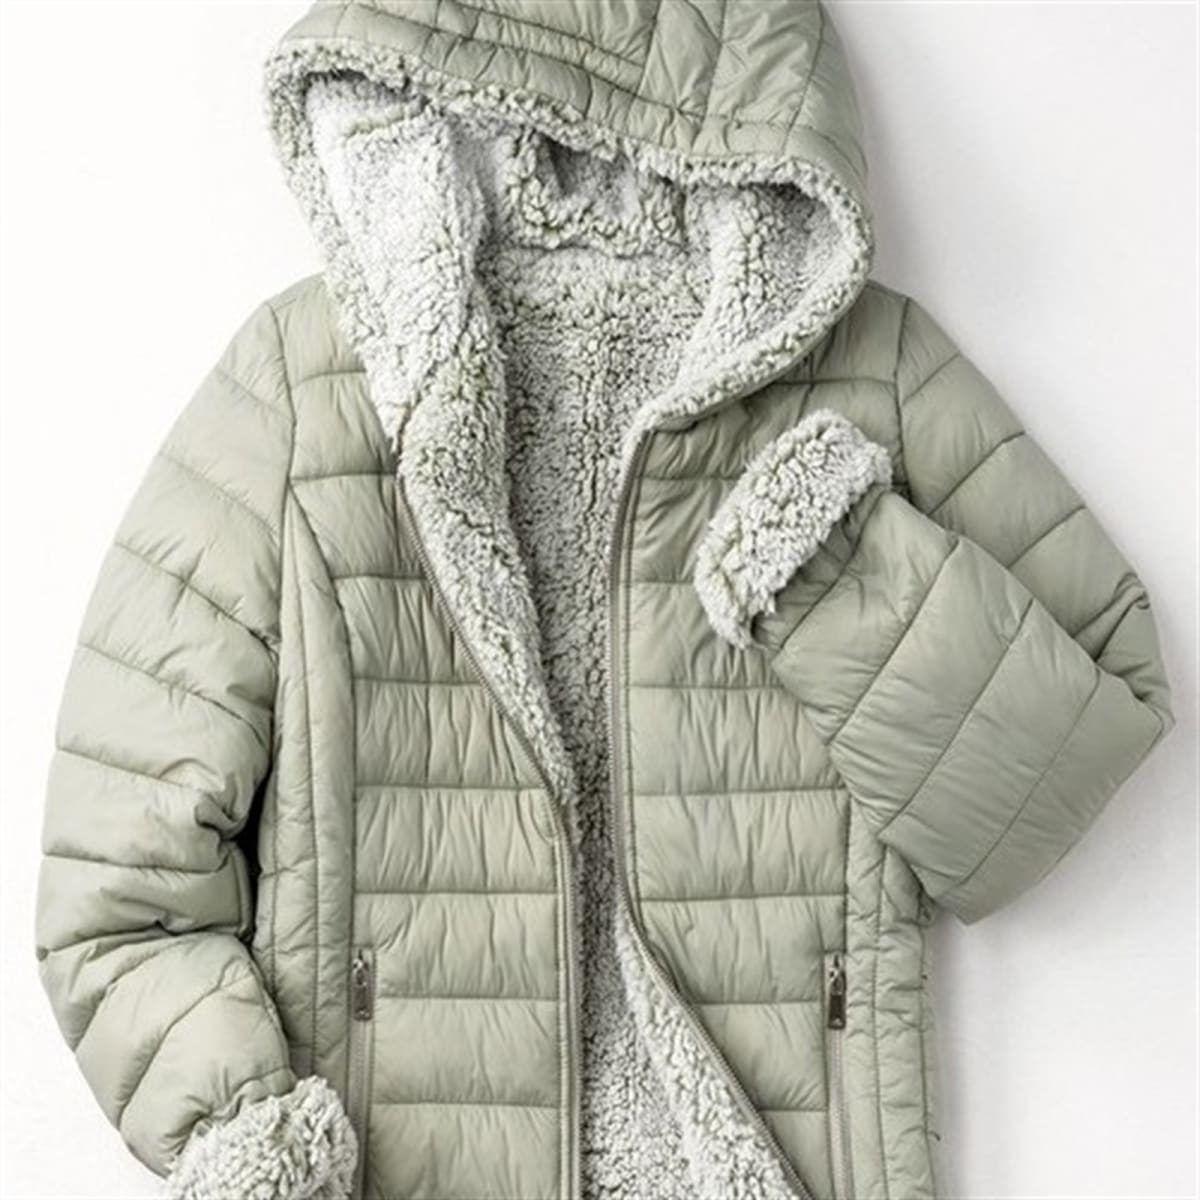 Reversible Sherpa Puffer Jacket Jackets Reversible Jackets Puffer Jackets [ 1200 x 1200 Pixel ]